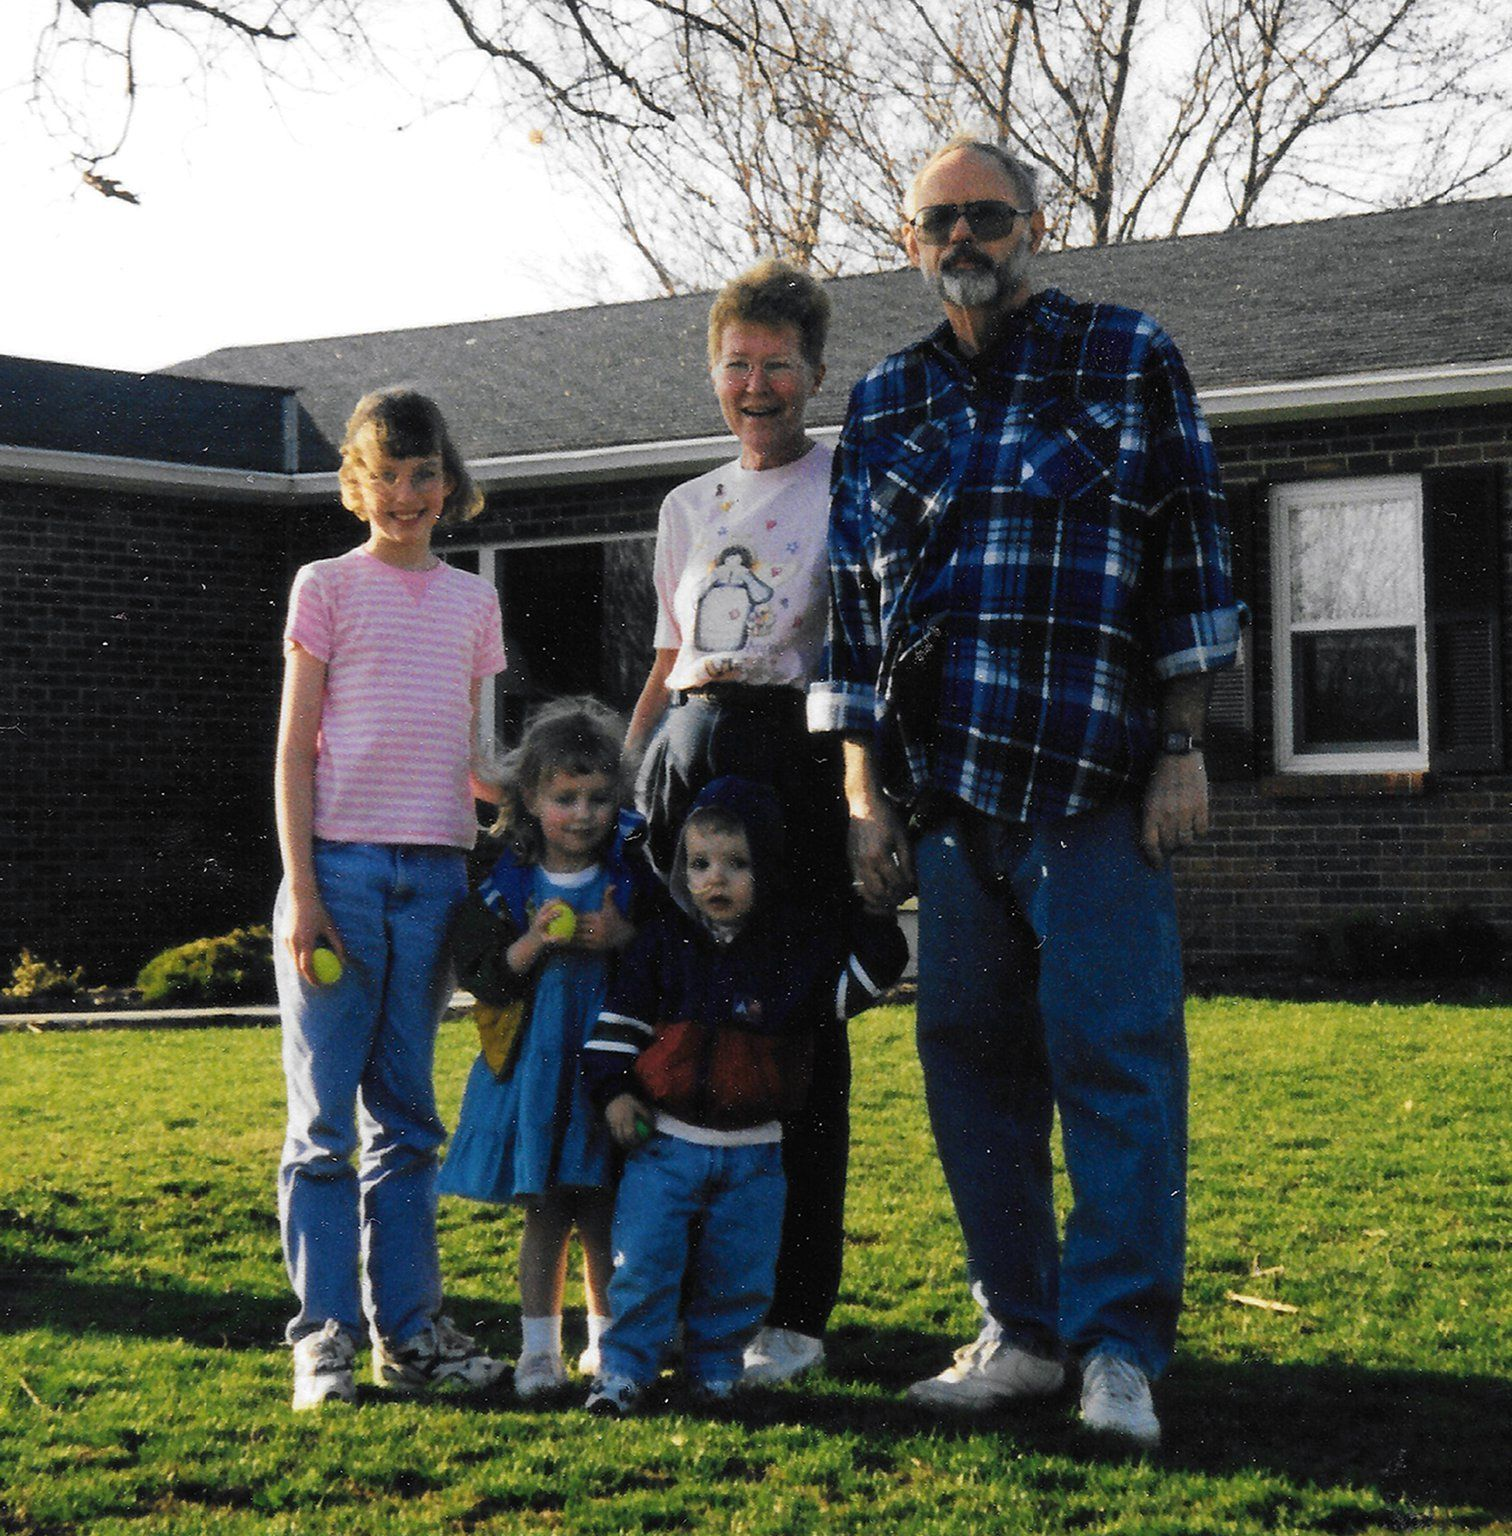 Pancreatic cancer awareness: Family has a cause